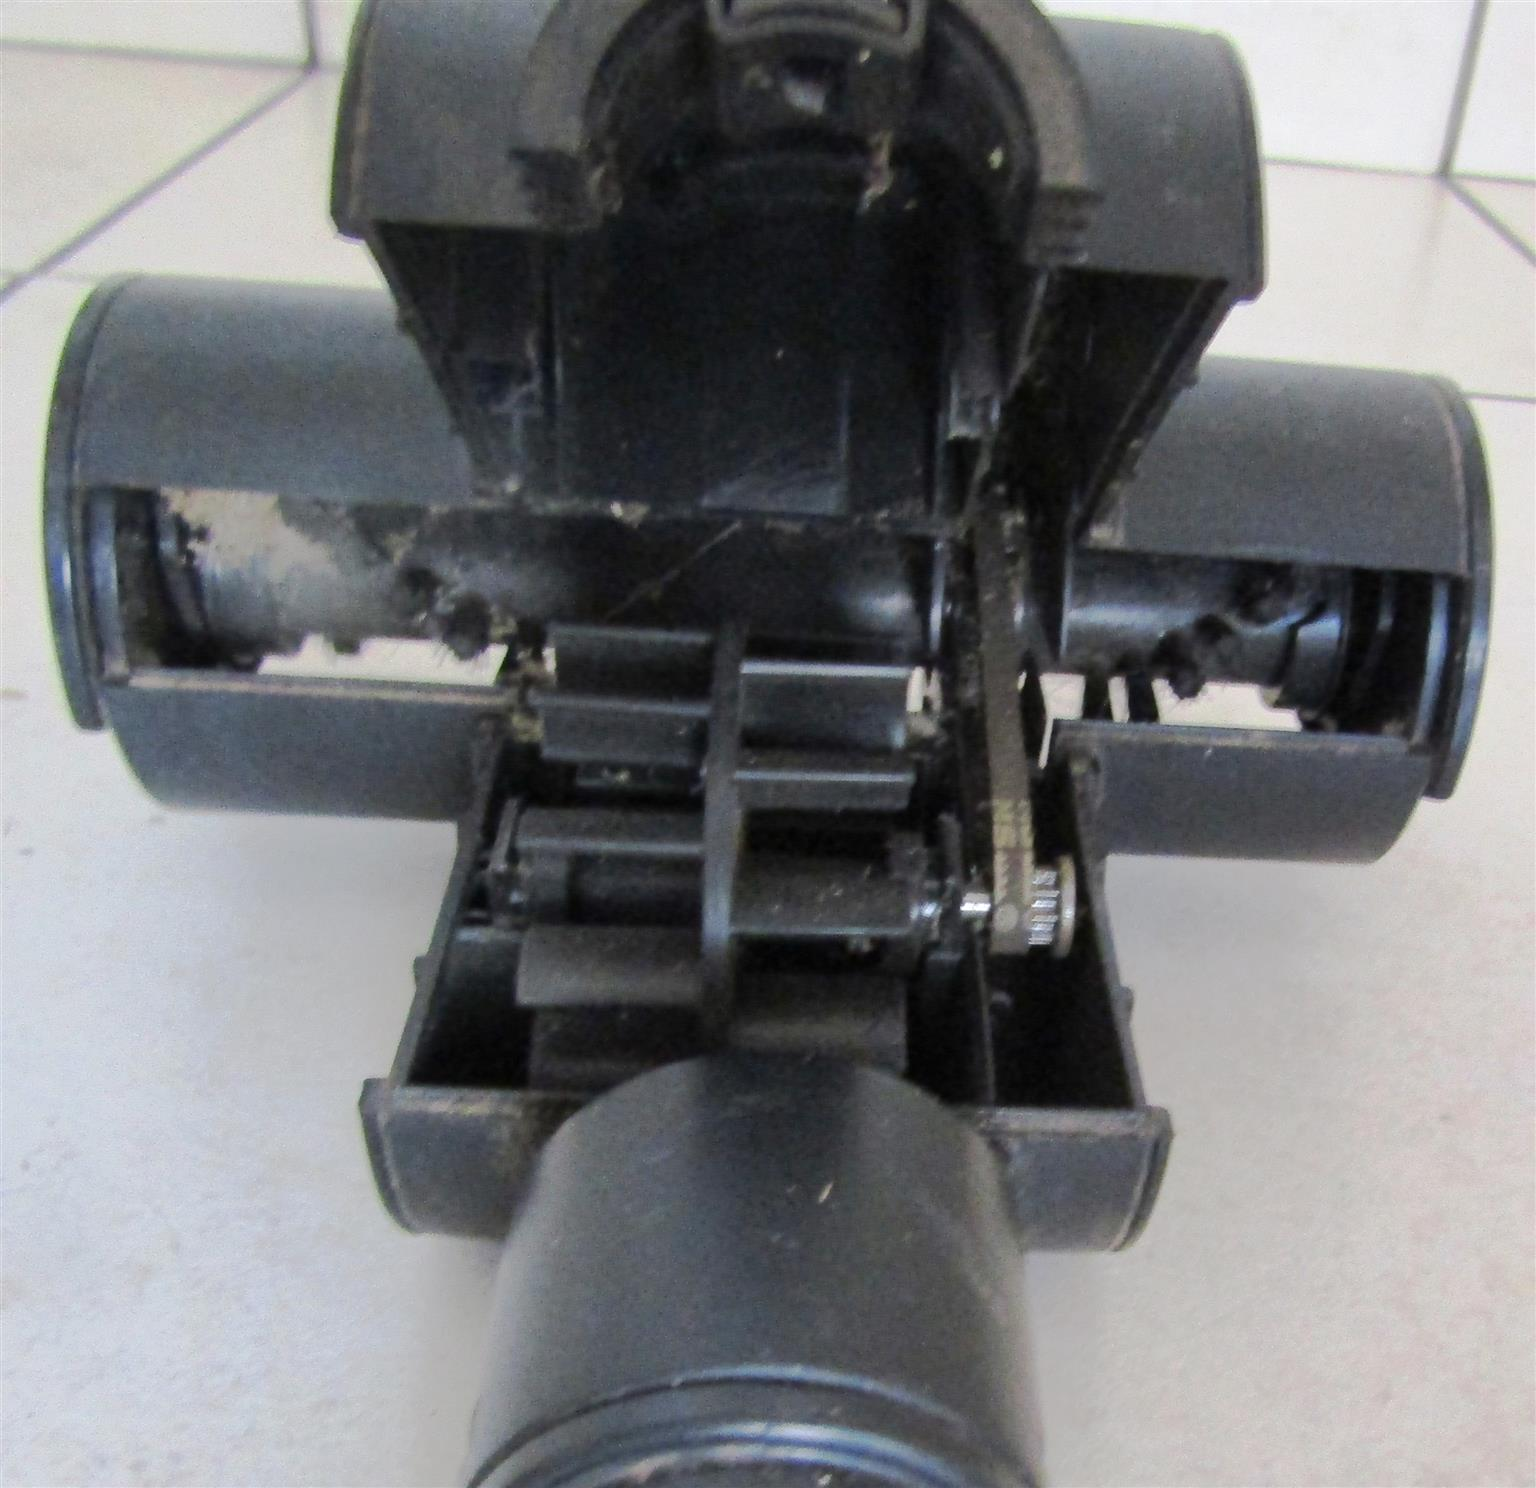 Vacuum Cleaner Rotating Brush Attachment Junk Mail